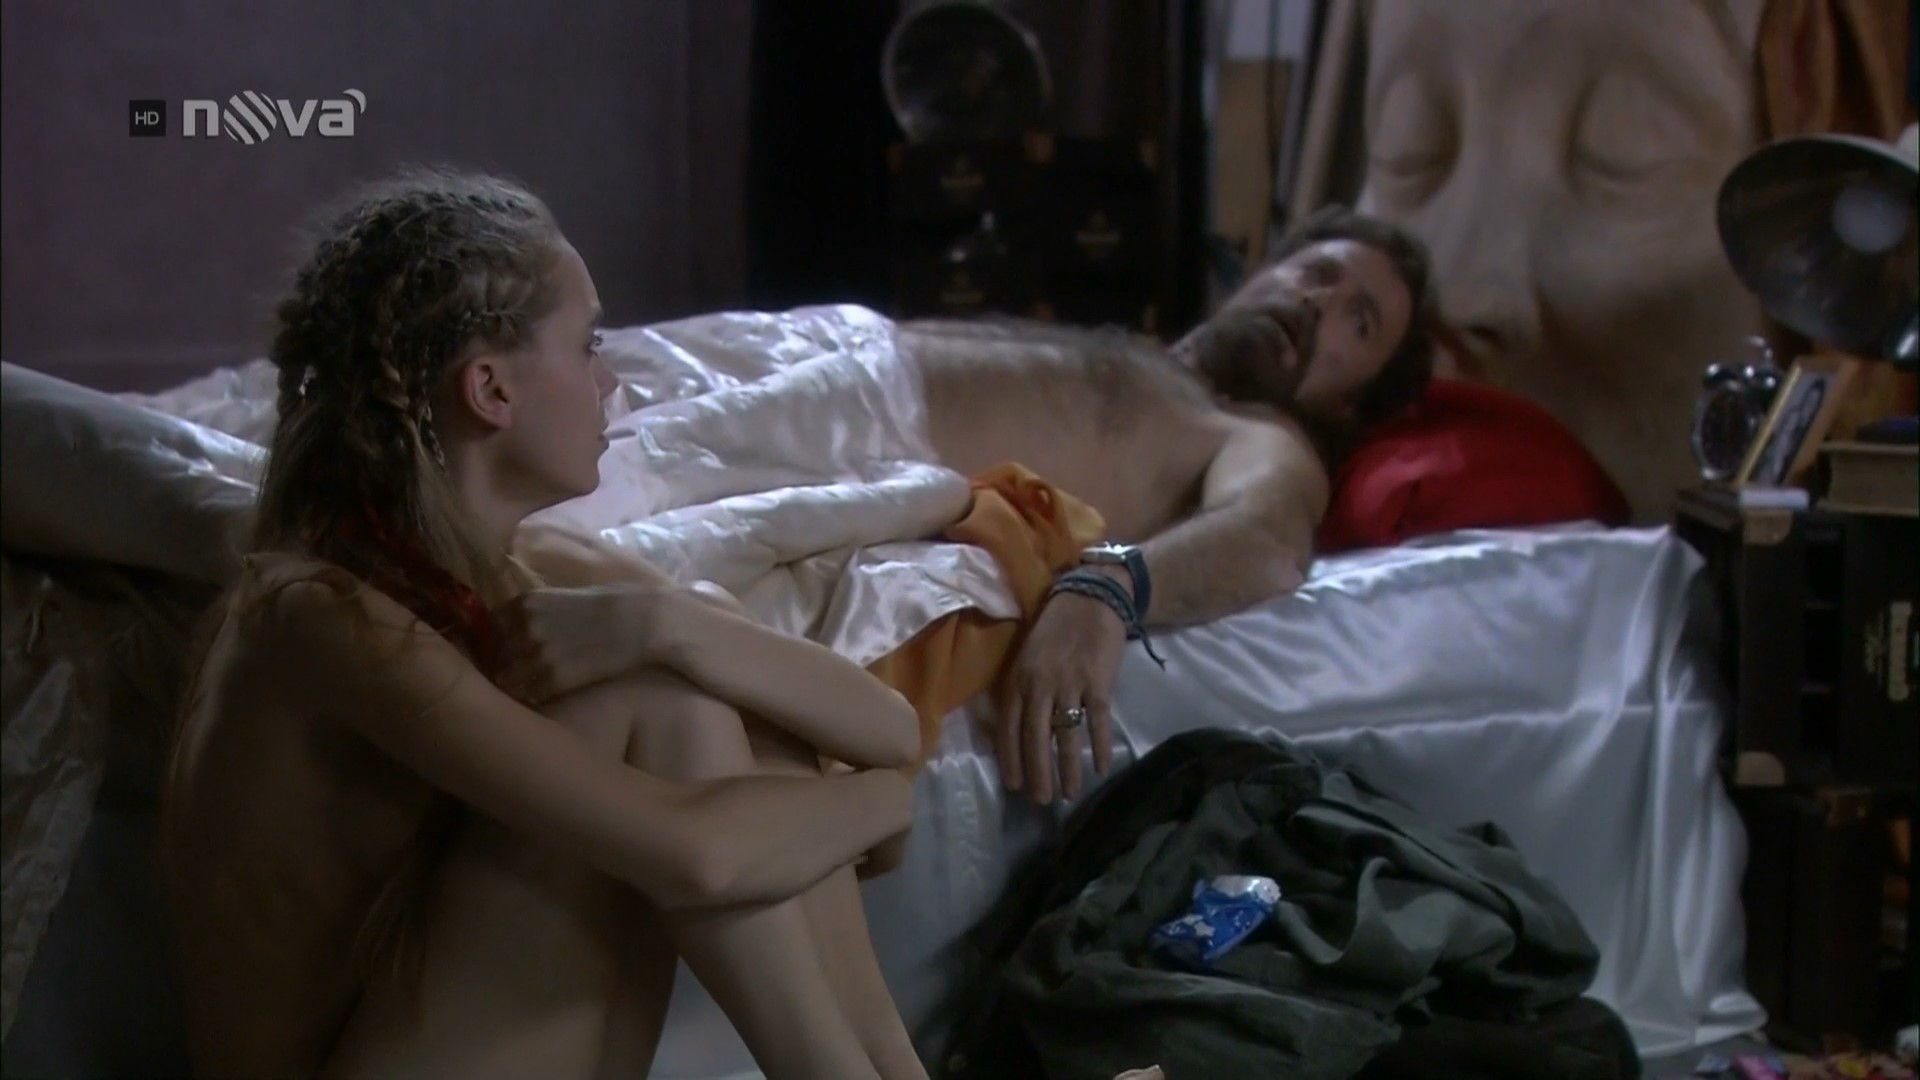 Opinion vondrackova nudes special case